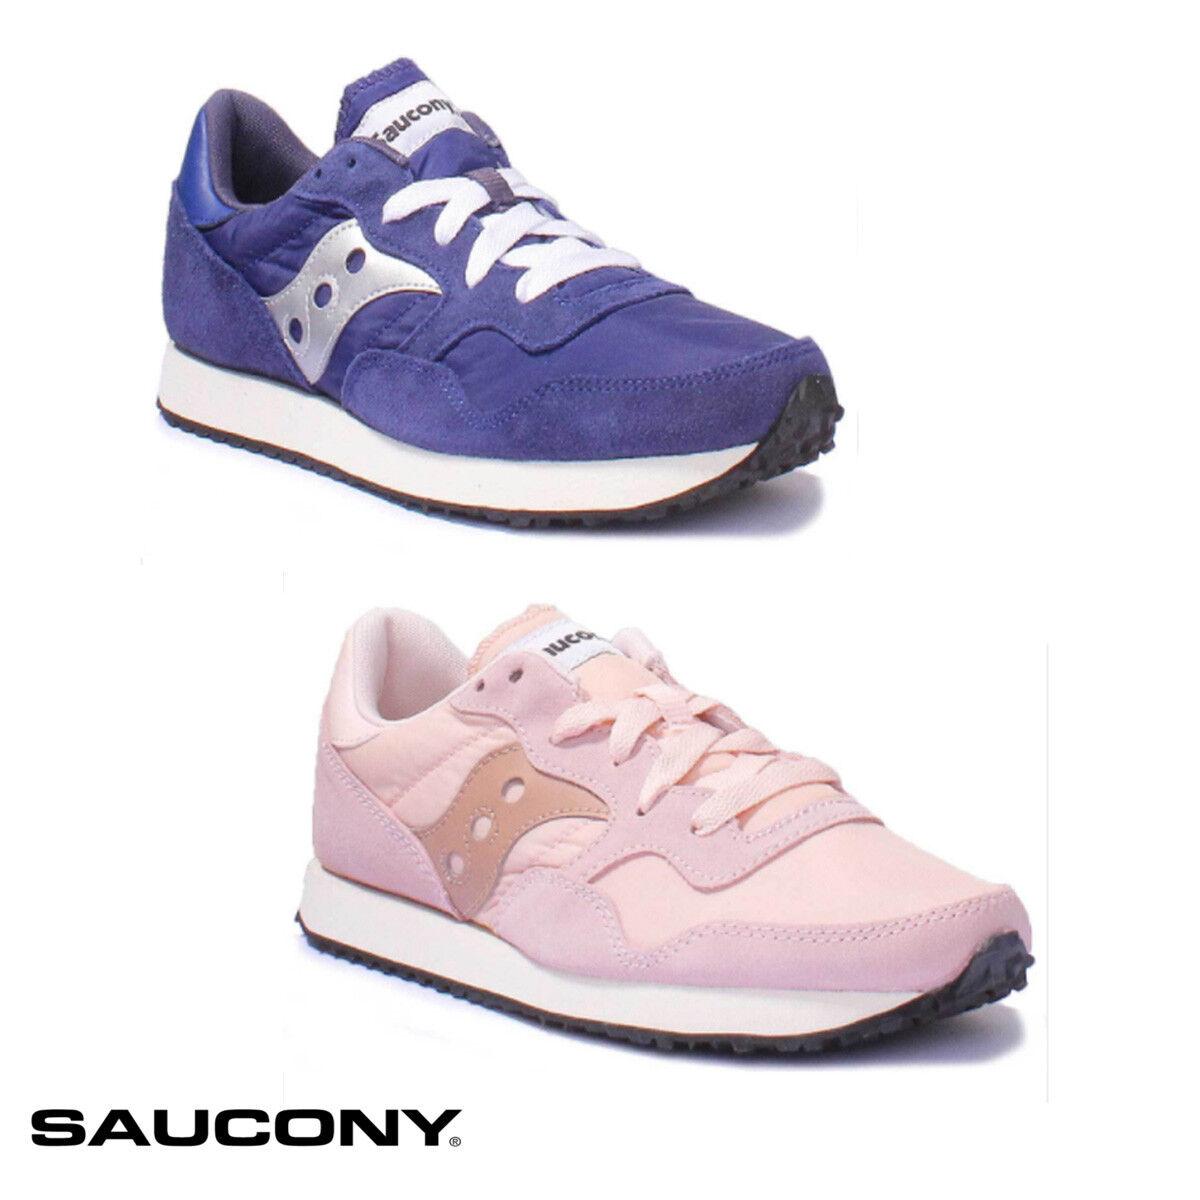 SAUCONY JAZZ SCARPE scarpe da ginnastica DONNA CAMOSCIO NUOVE ORIGINAL   Economico    Scolaro/Ragazze Scarpa